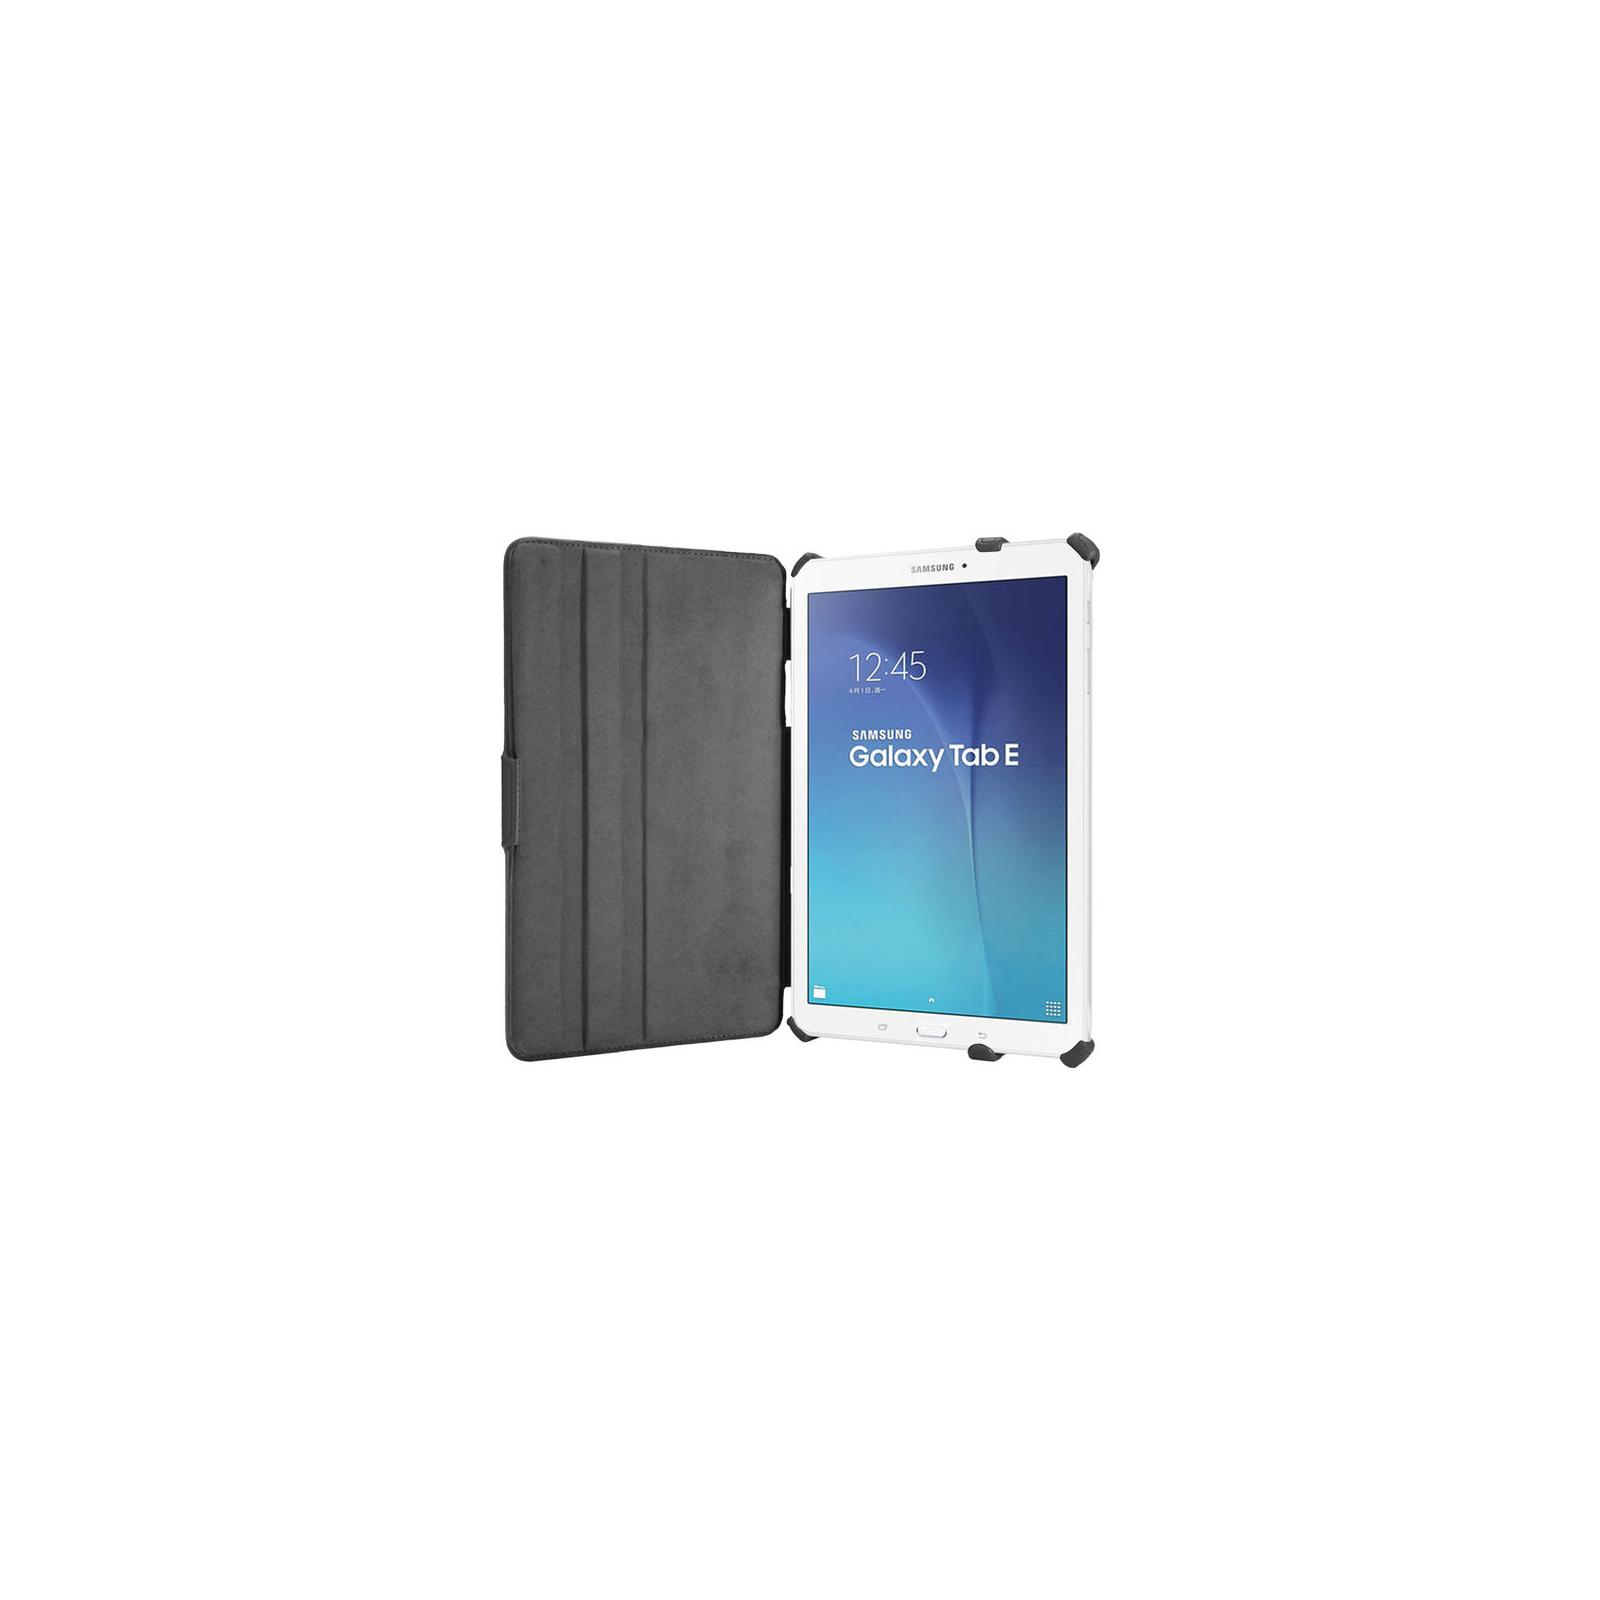 Чехол для планшета AirOn для Samsung Galaxy Tab E 9.6 black (4822352779559) изображение 8